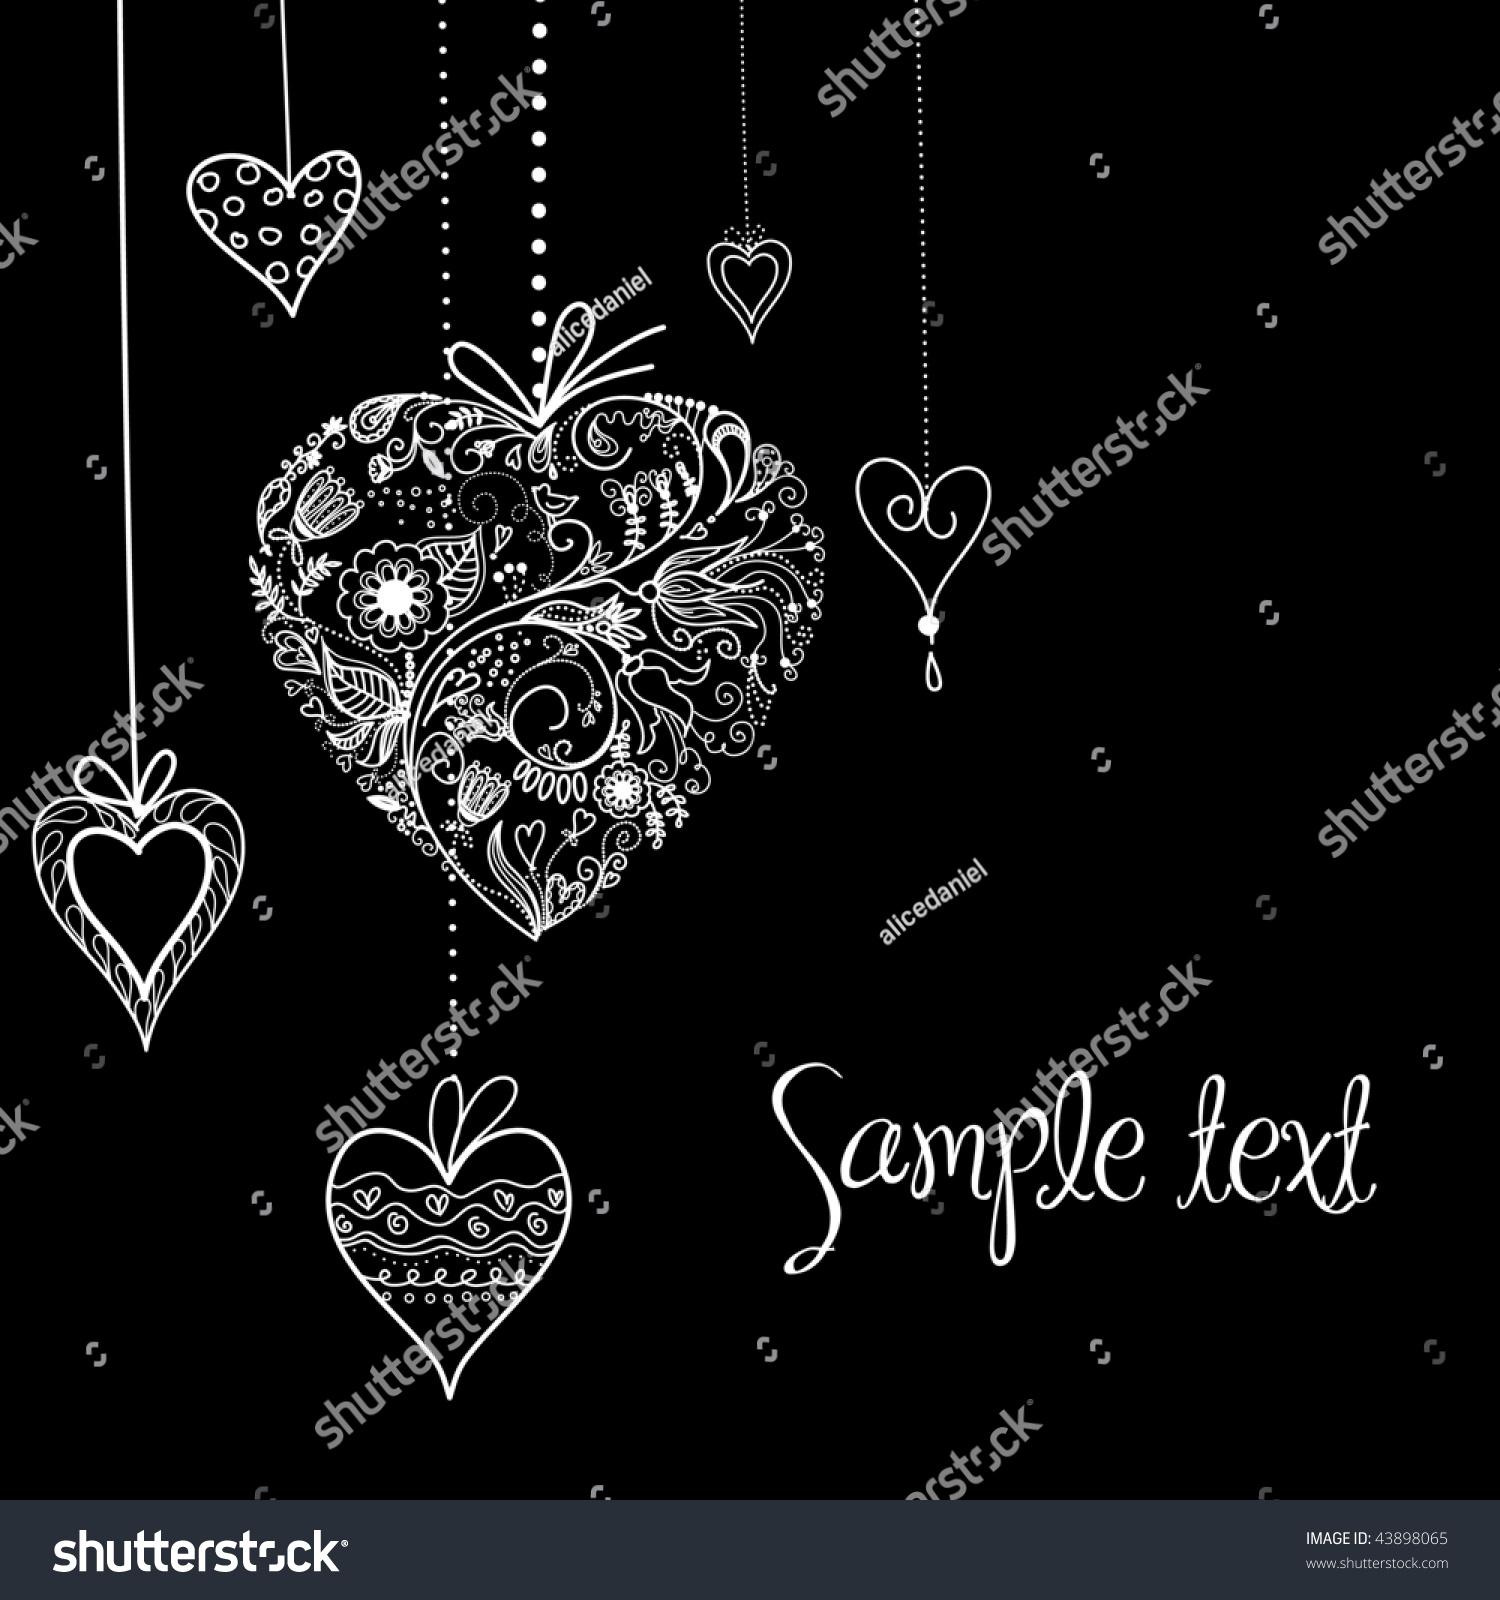 Black And White Valentine Heart Shapes Illustration